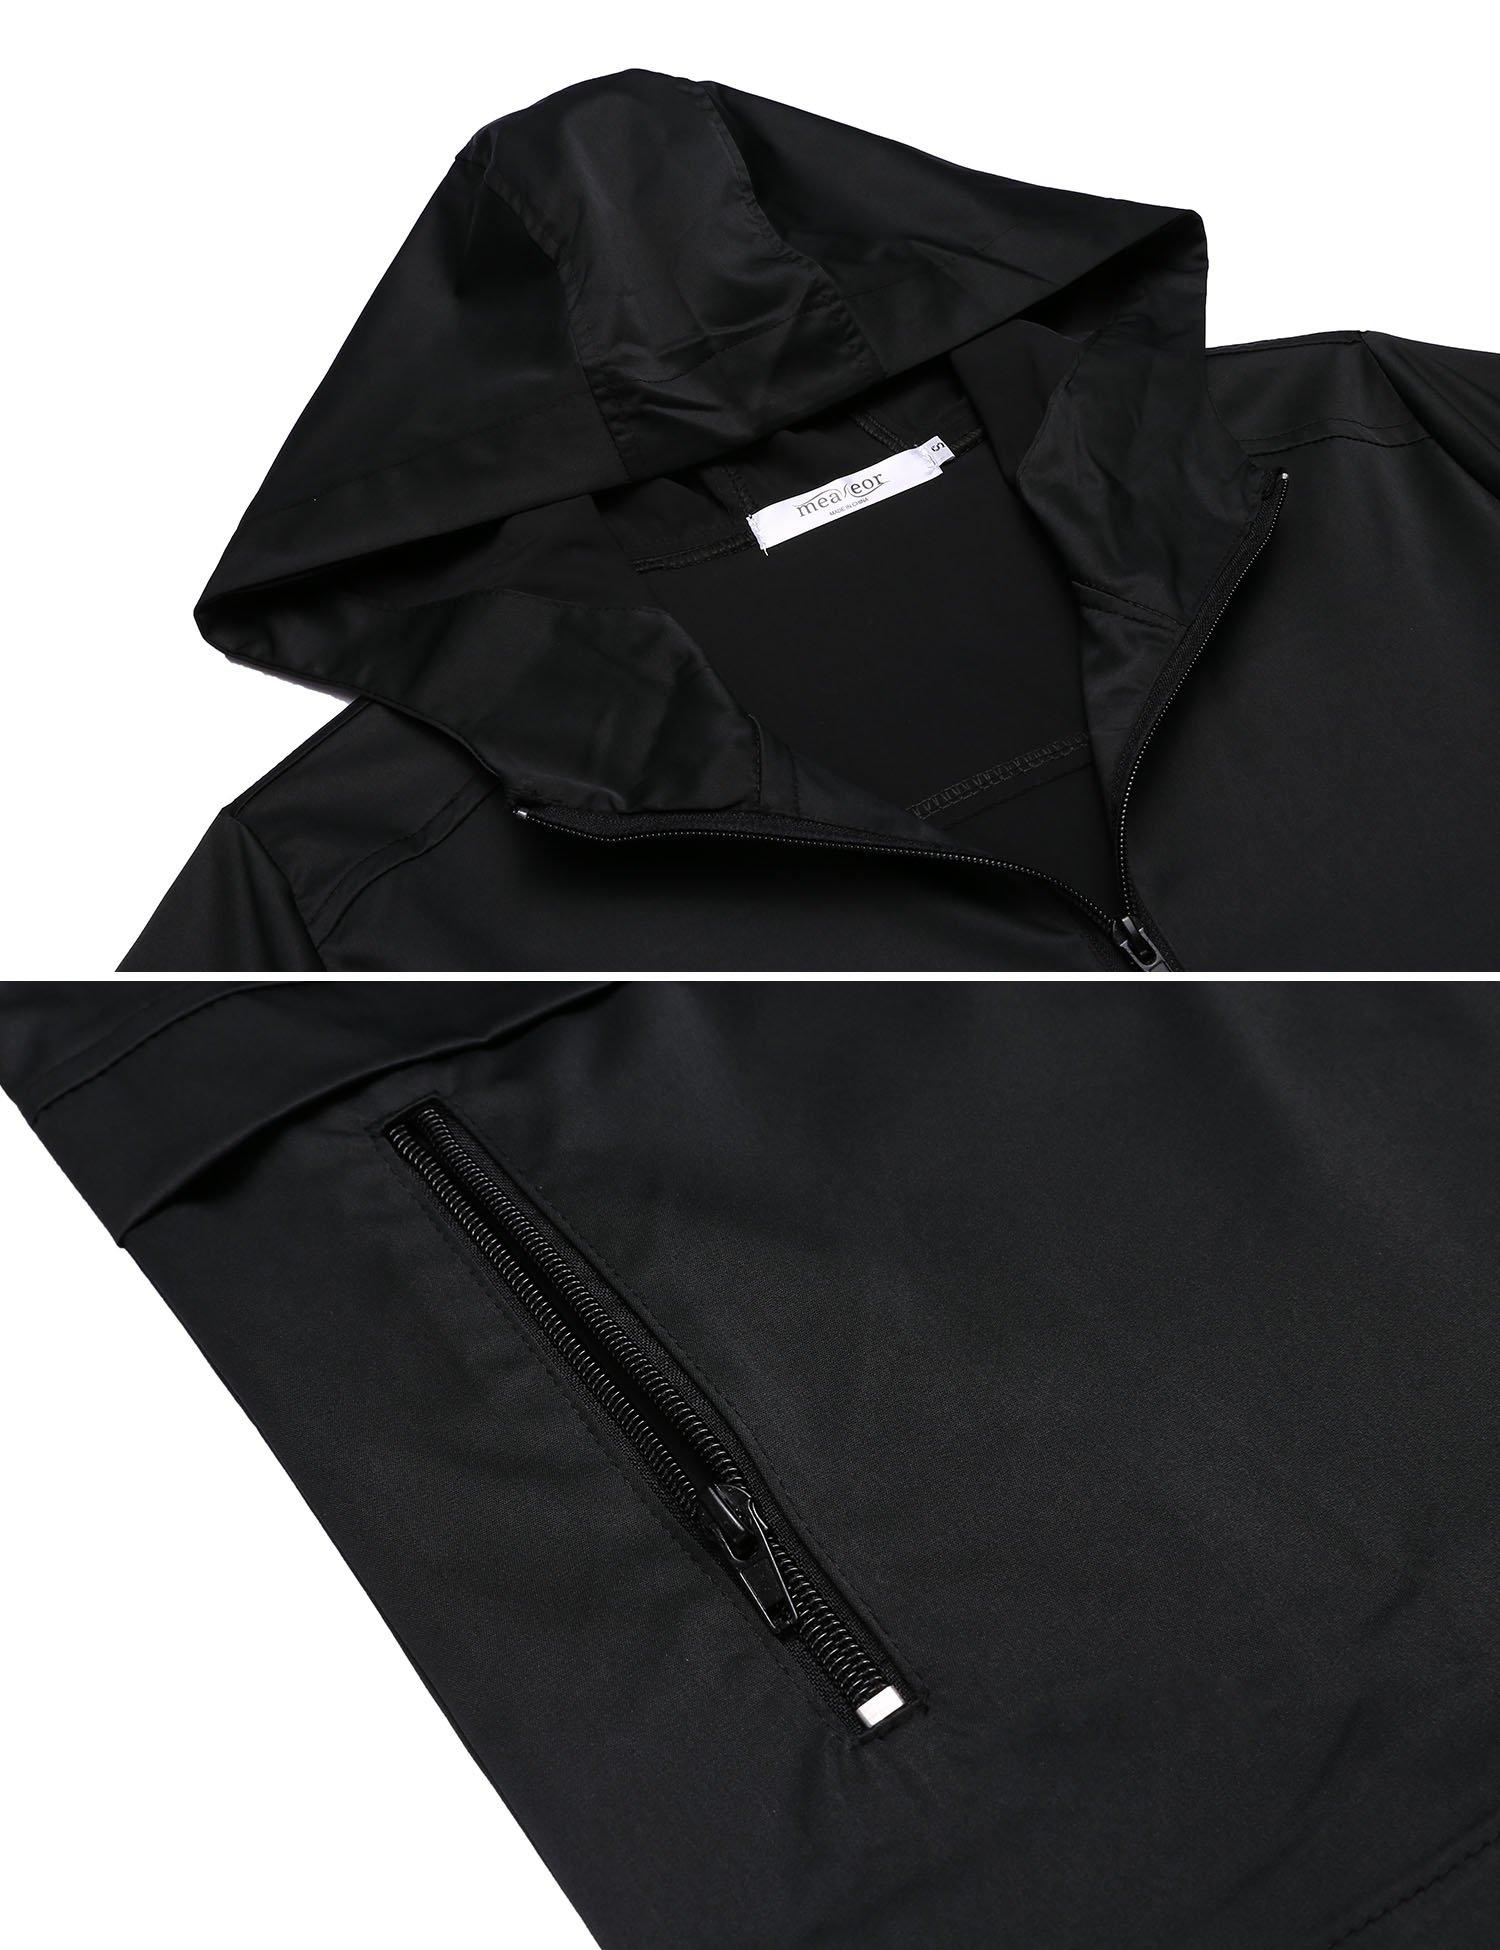 SummerRio Women's Waterproof Venture Resolve Softshell Rainwear Jacket (Black,Medium) by SummerRio (Image #6)